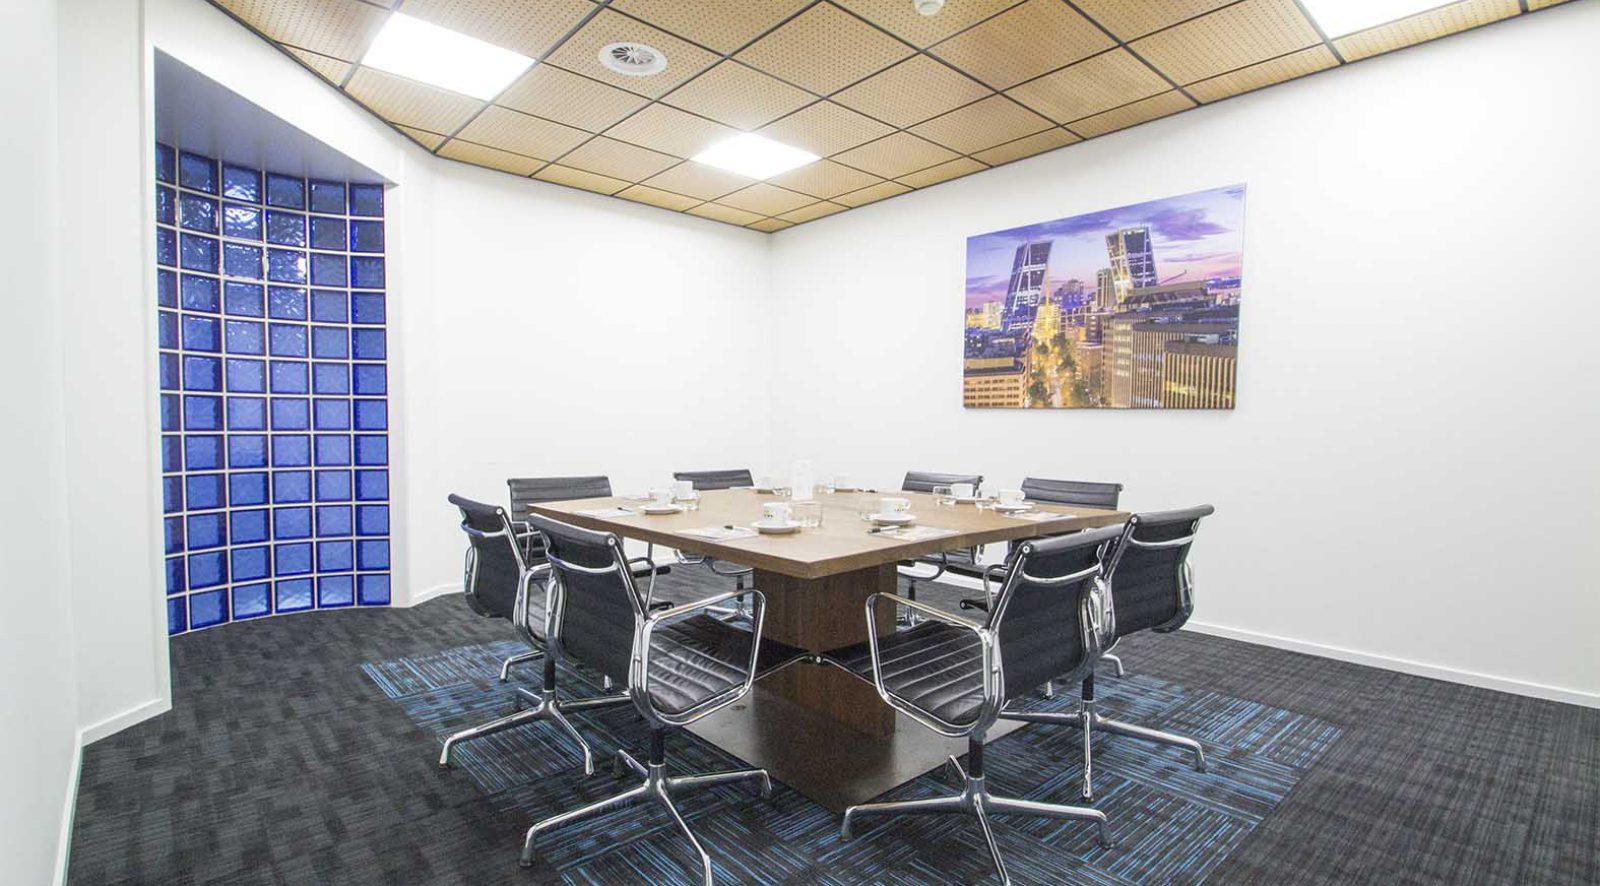 Vergaderruimte reserveren Haarlem | Crown Business Center Haarlem